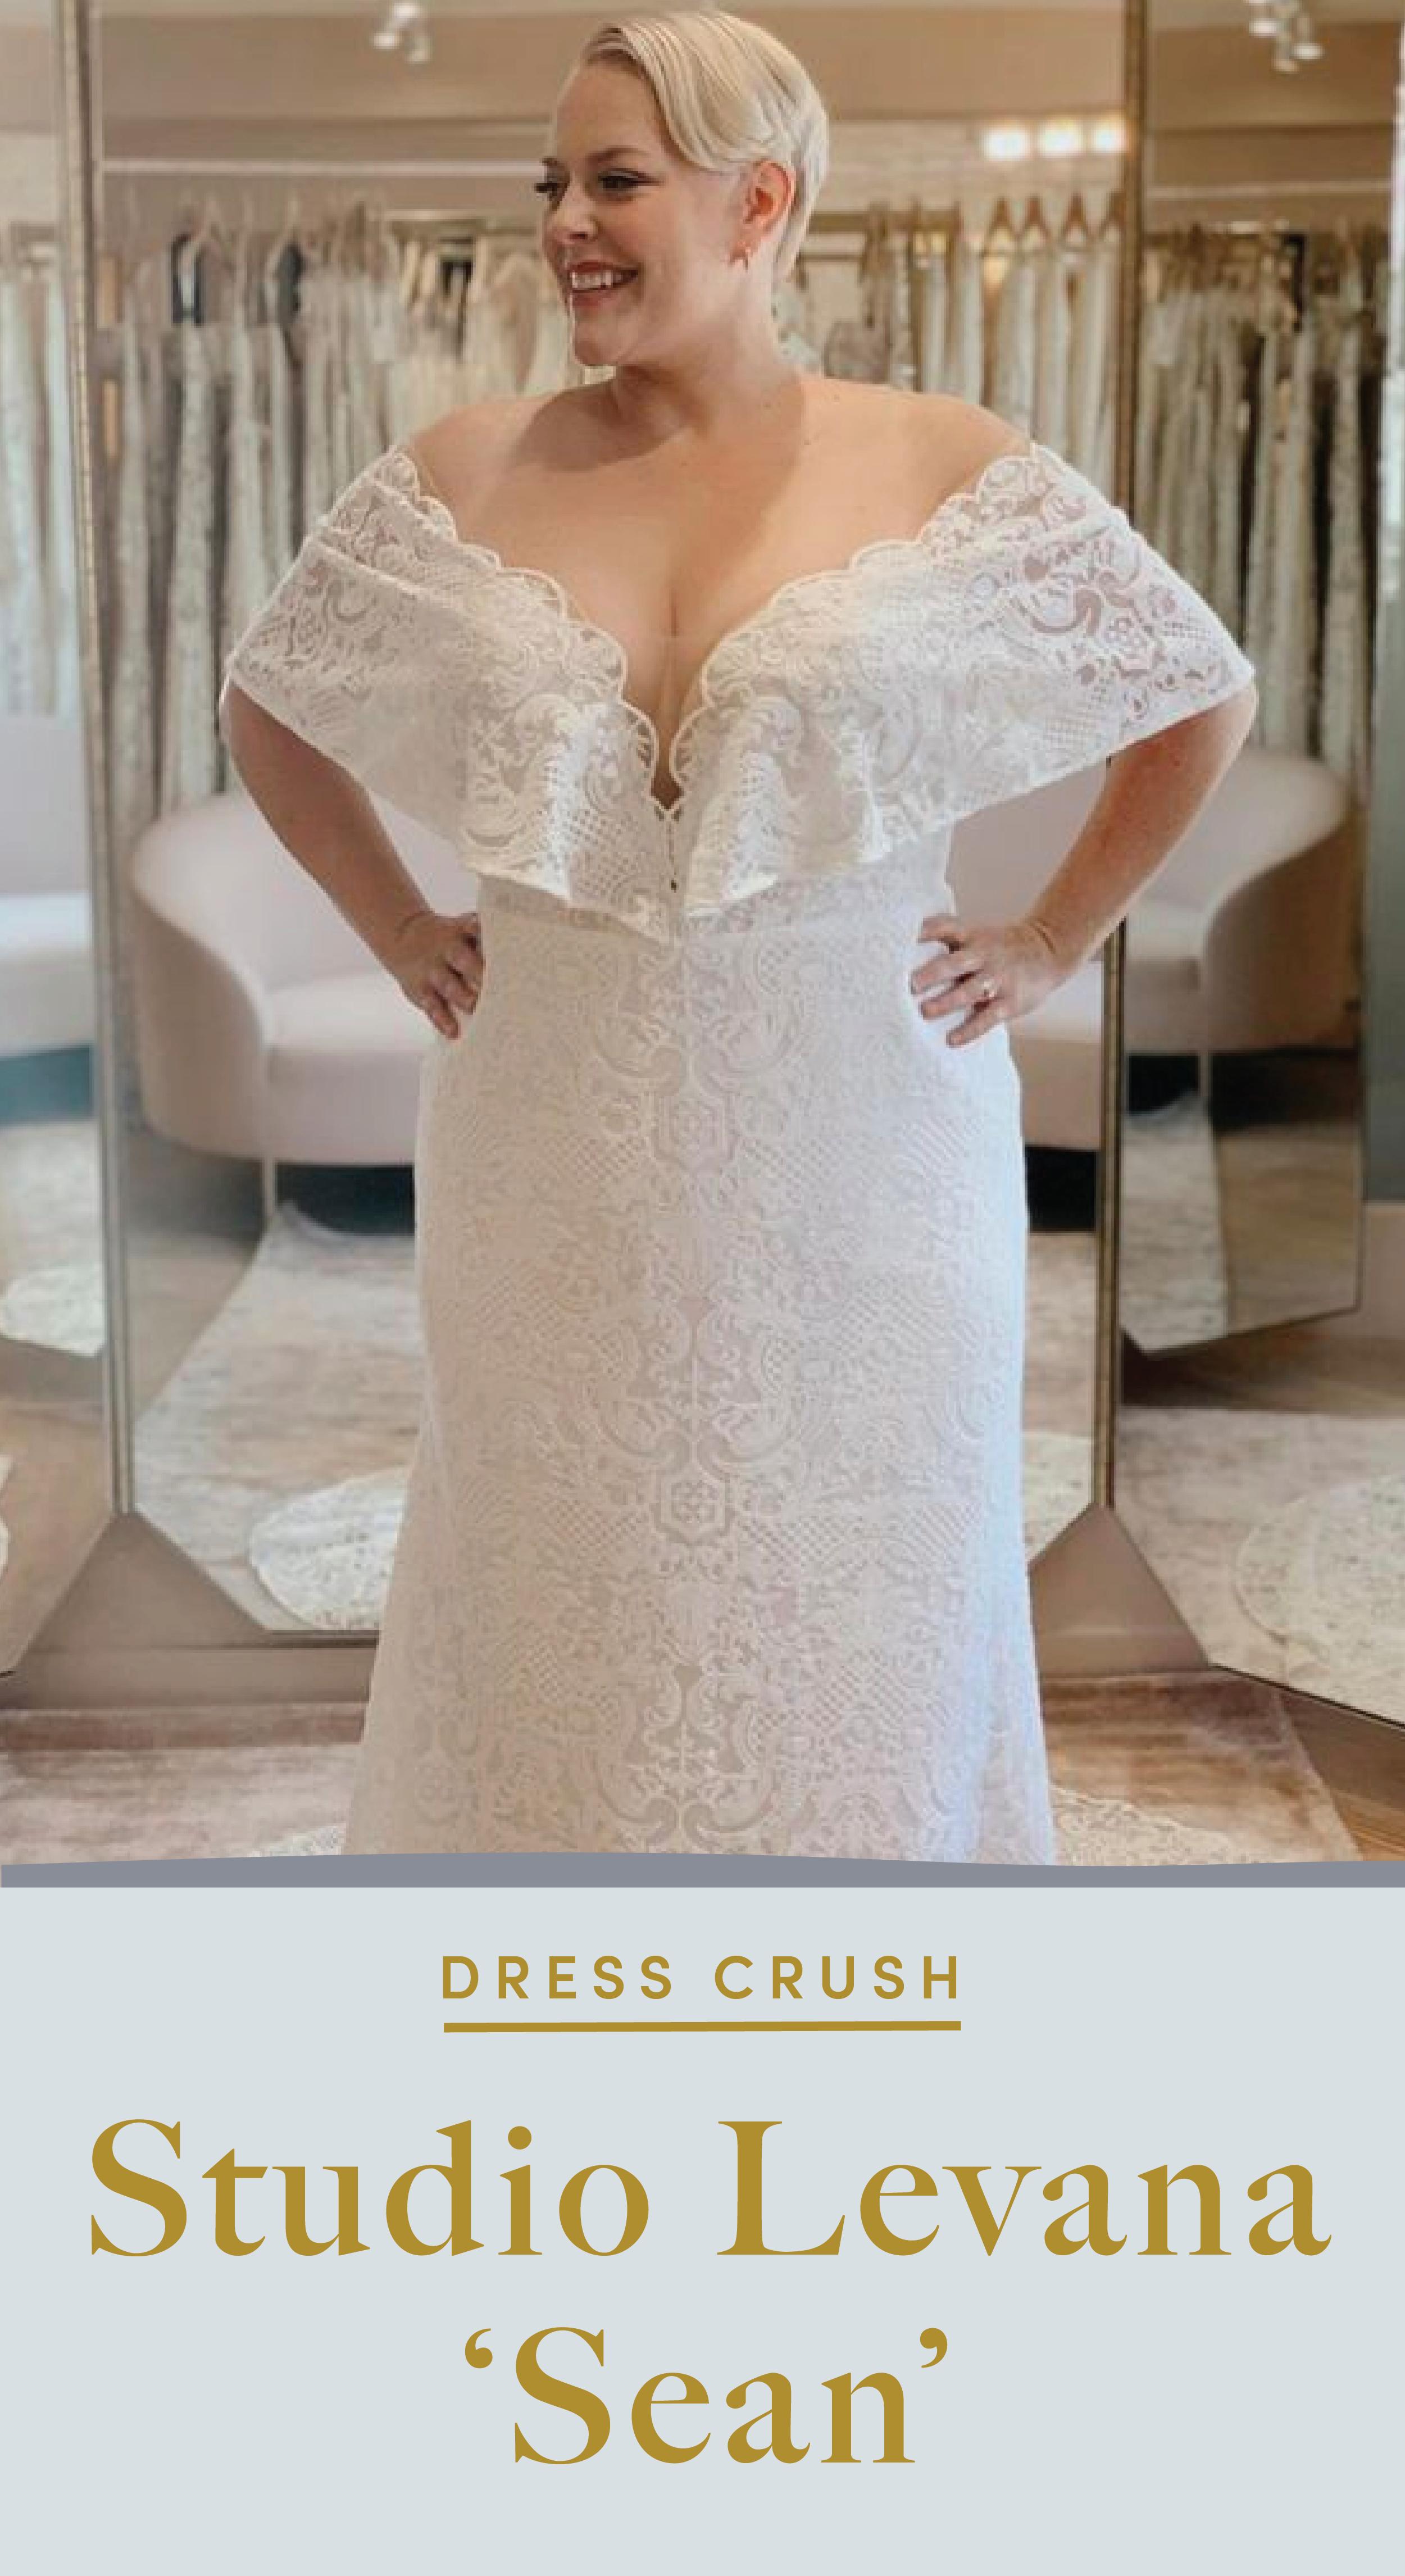 Studio Levana Sean Wedding Gown At Lovely Bride Curvy Wedding Dress Dresses Wedding Dress Shopping [ 4585 x 2501 Pixel ]